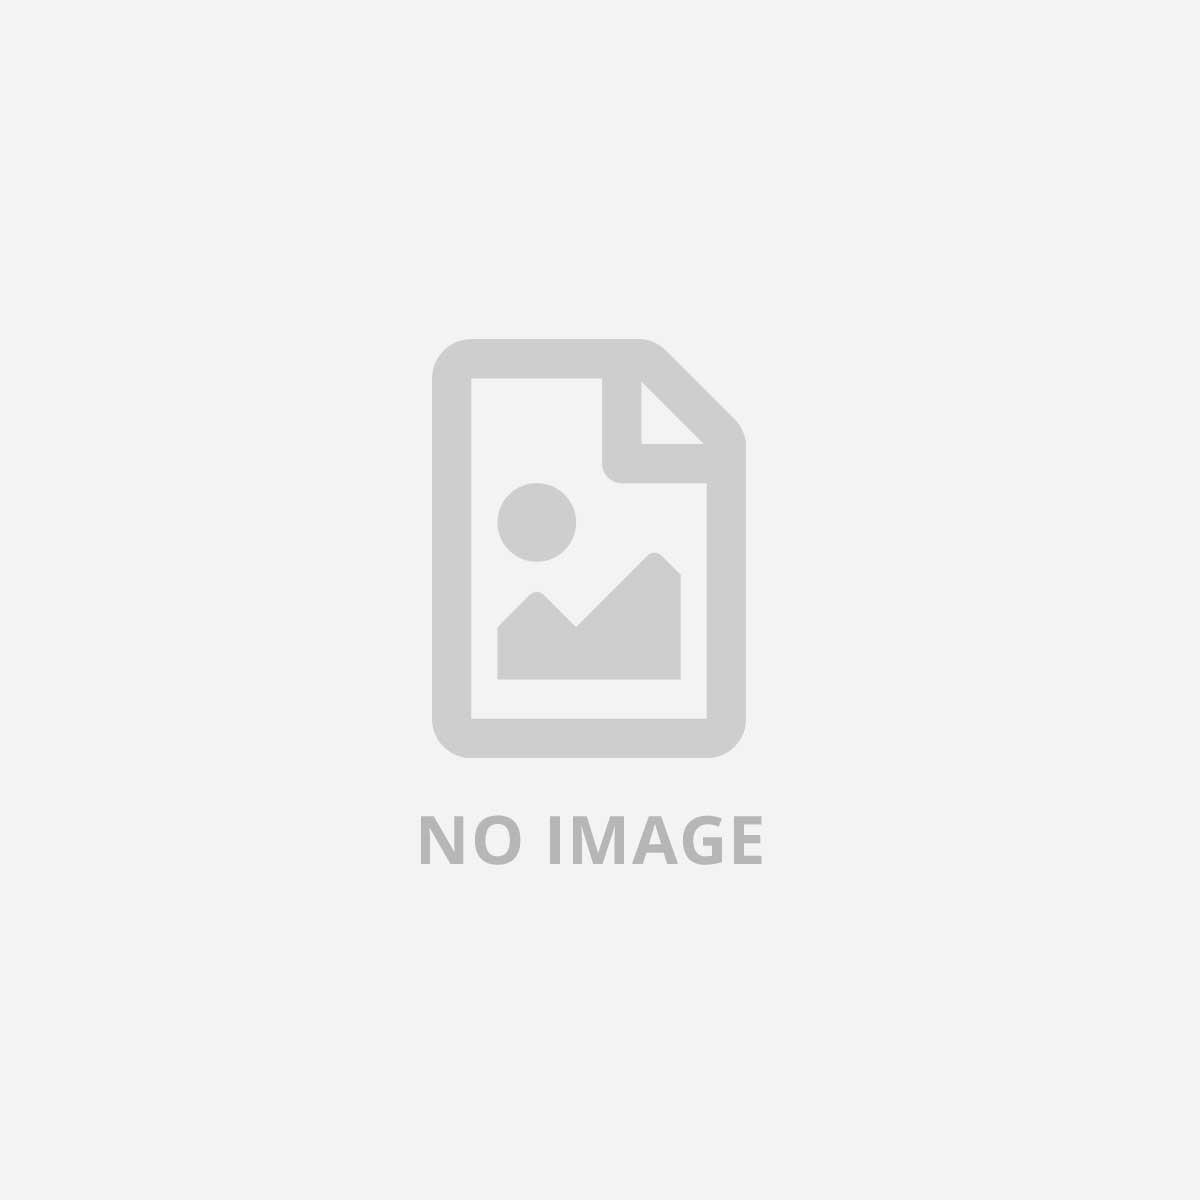 WATCHGUARD TRADE UP WTG AP125 3Y SECURE WI-FI